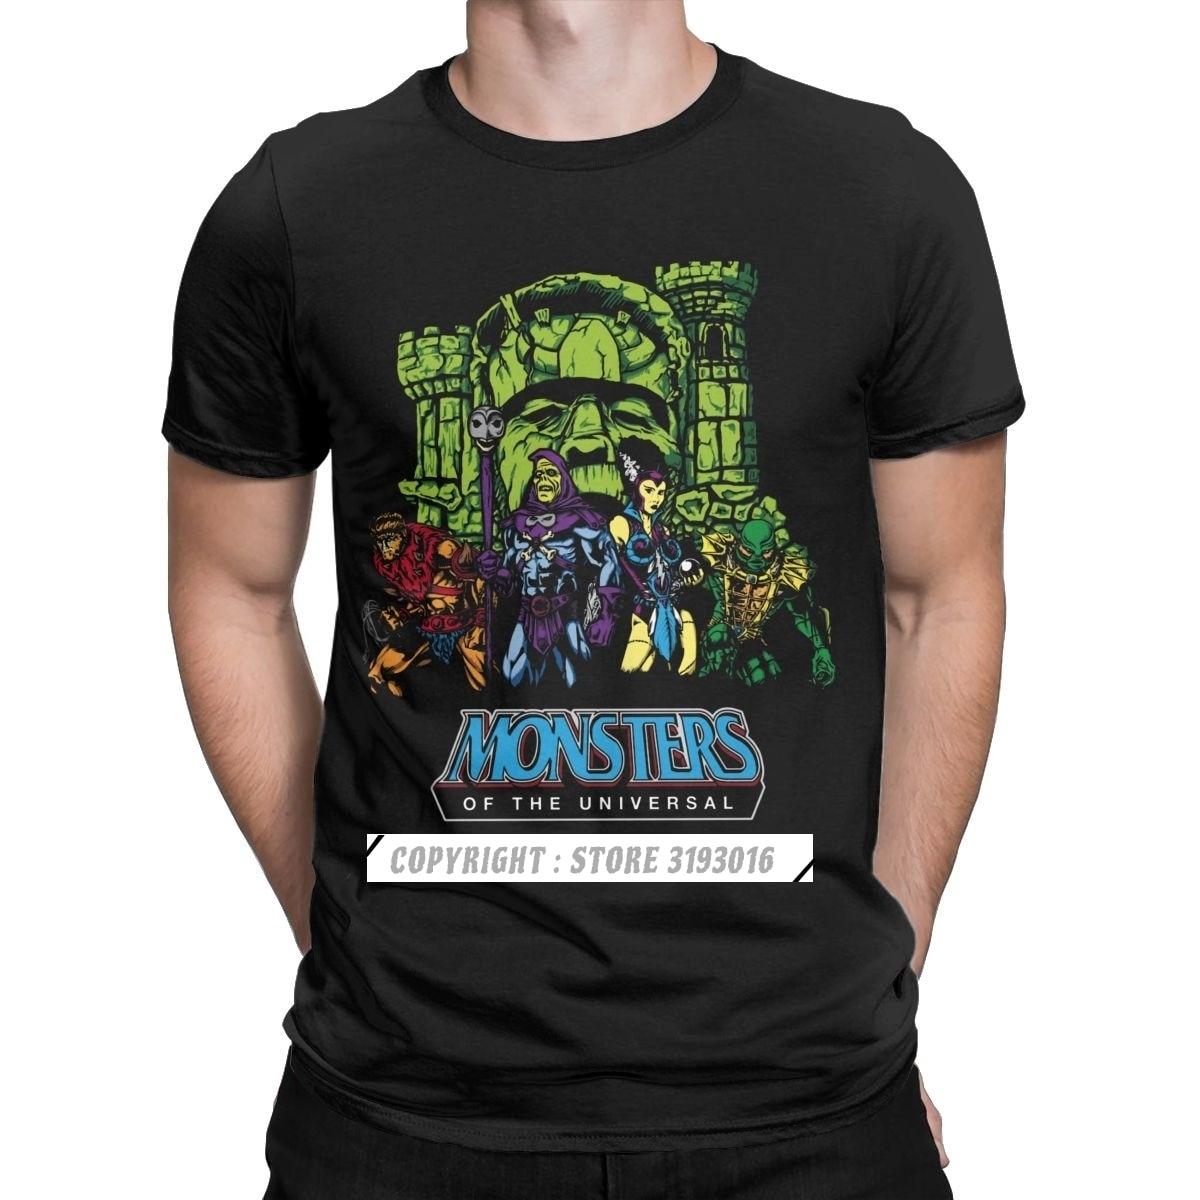 Canavarlar evrensel He-Man evren erkek T shirt Skeletor 80s she-ra Beast tee T shirt pamuk